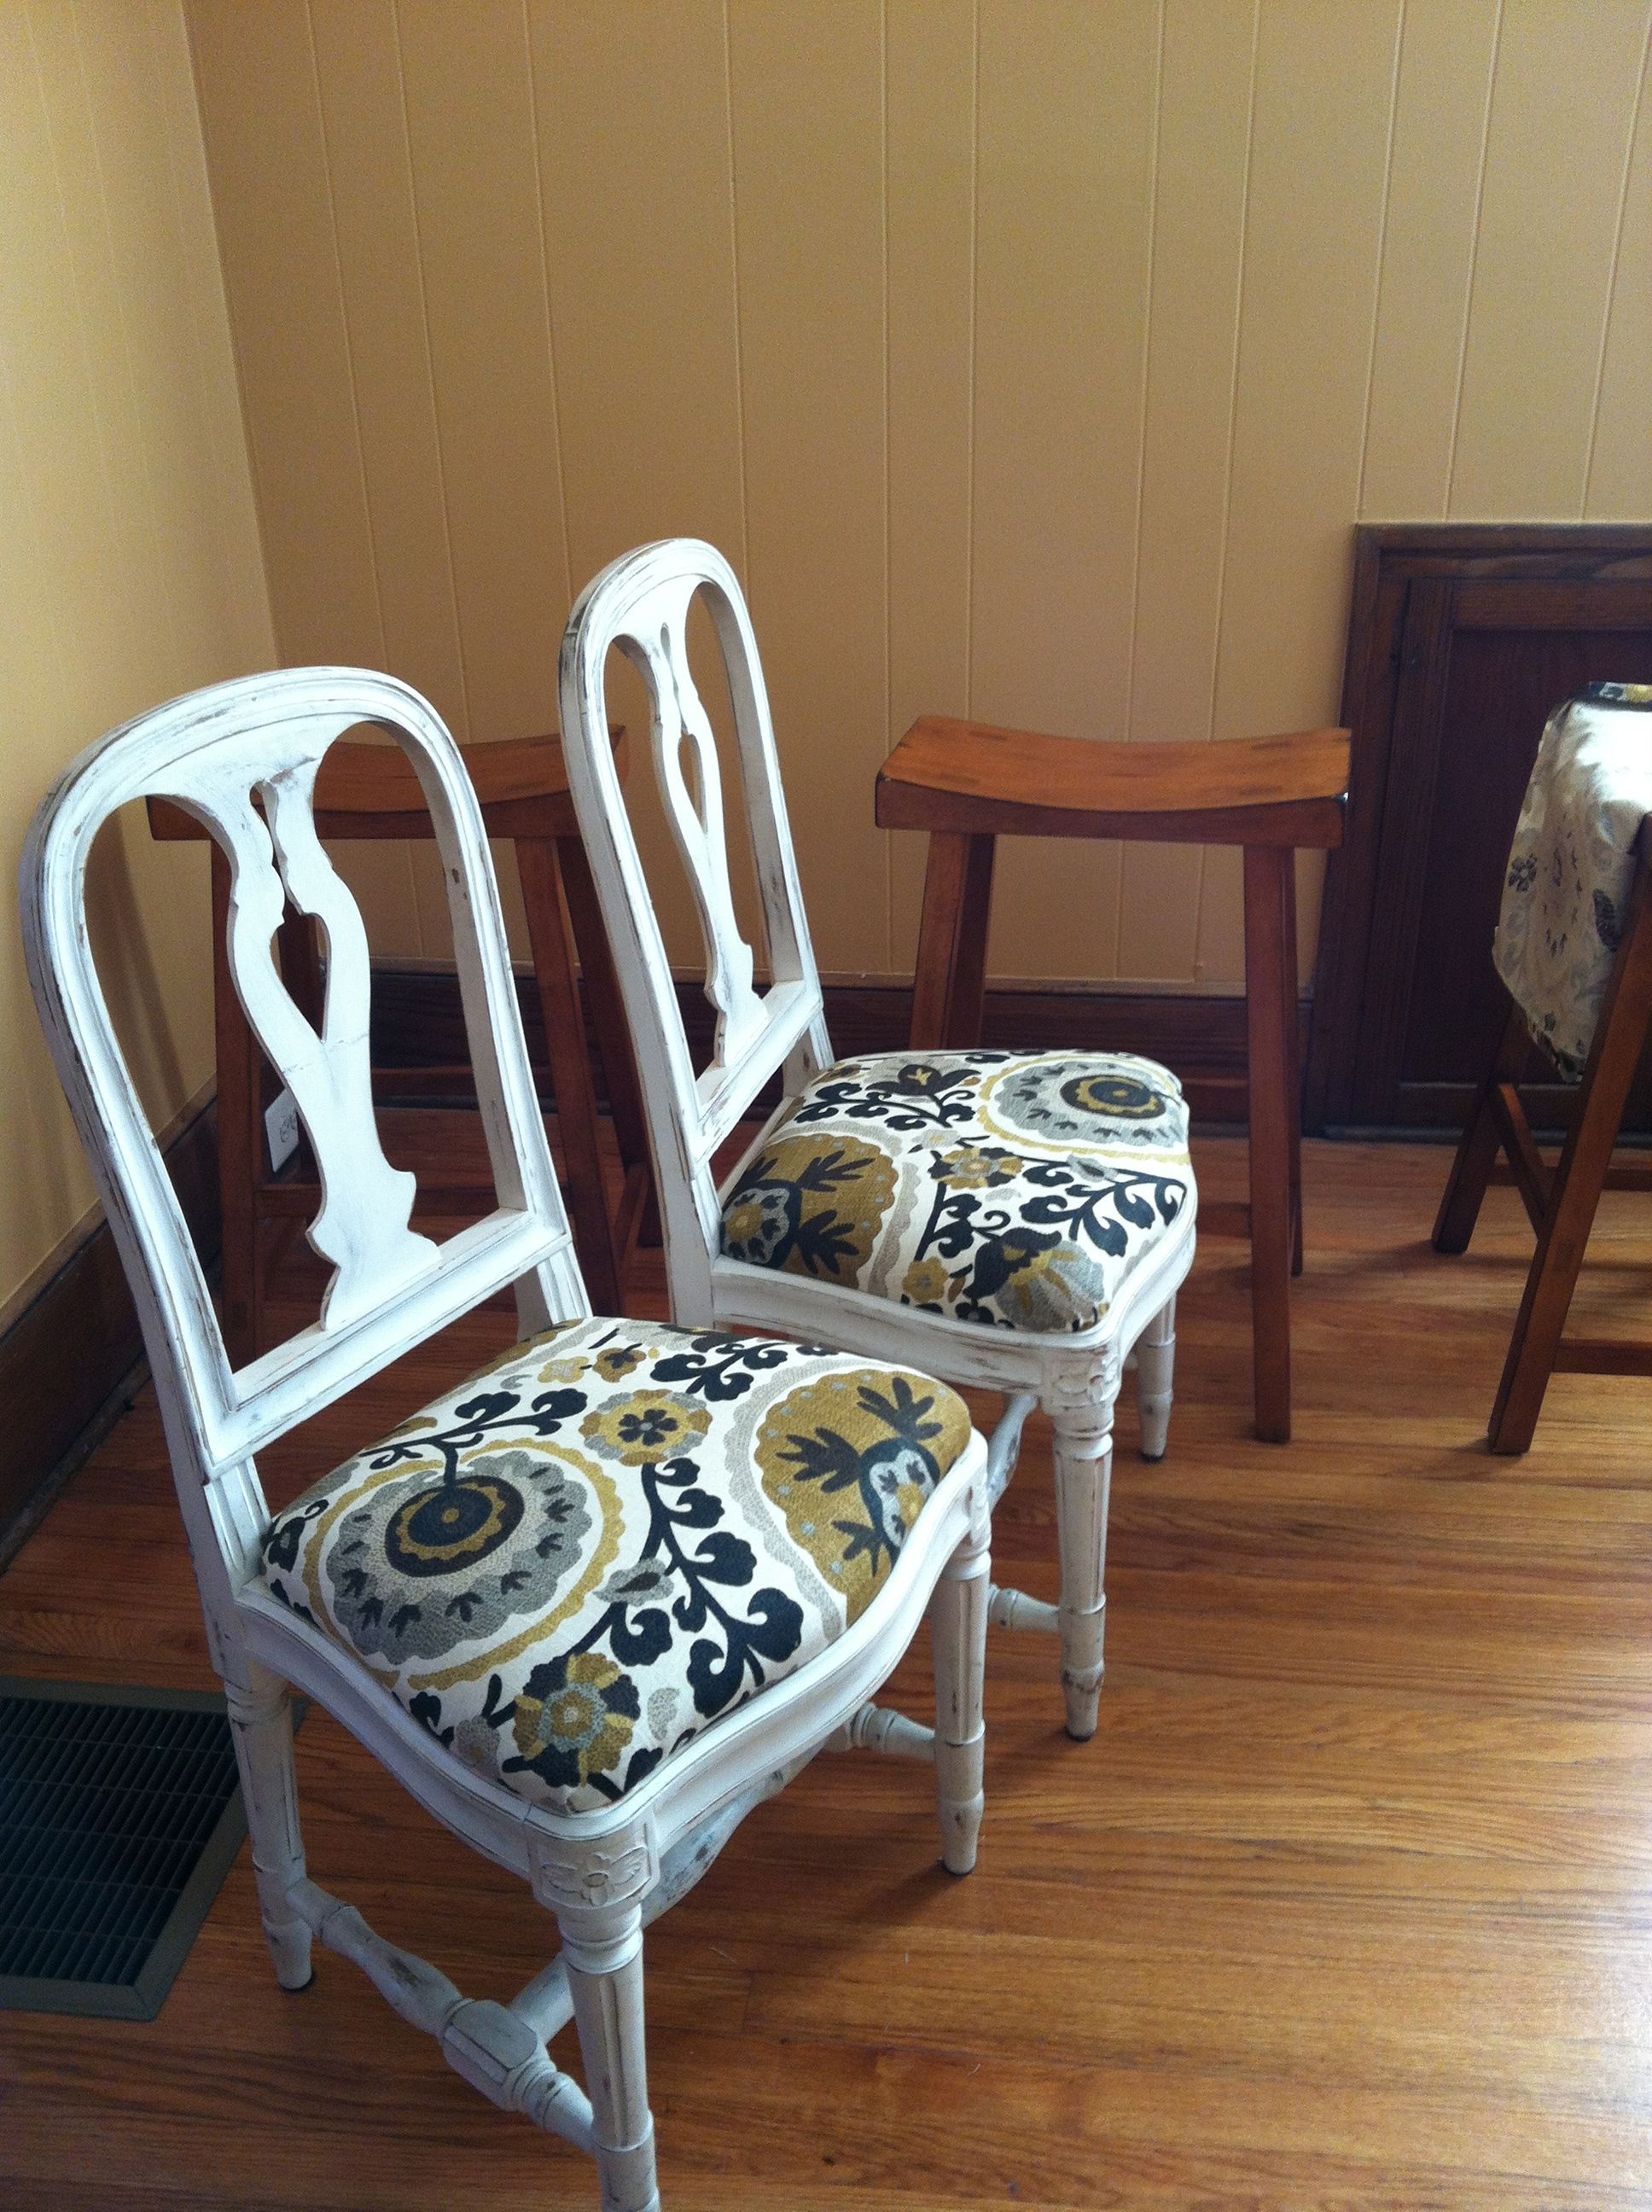 Ikea Gustavian Swedish Chairs circa 1995, that I recovered